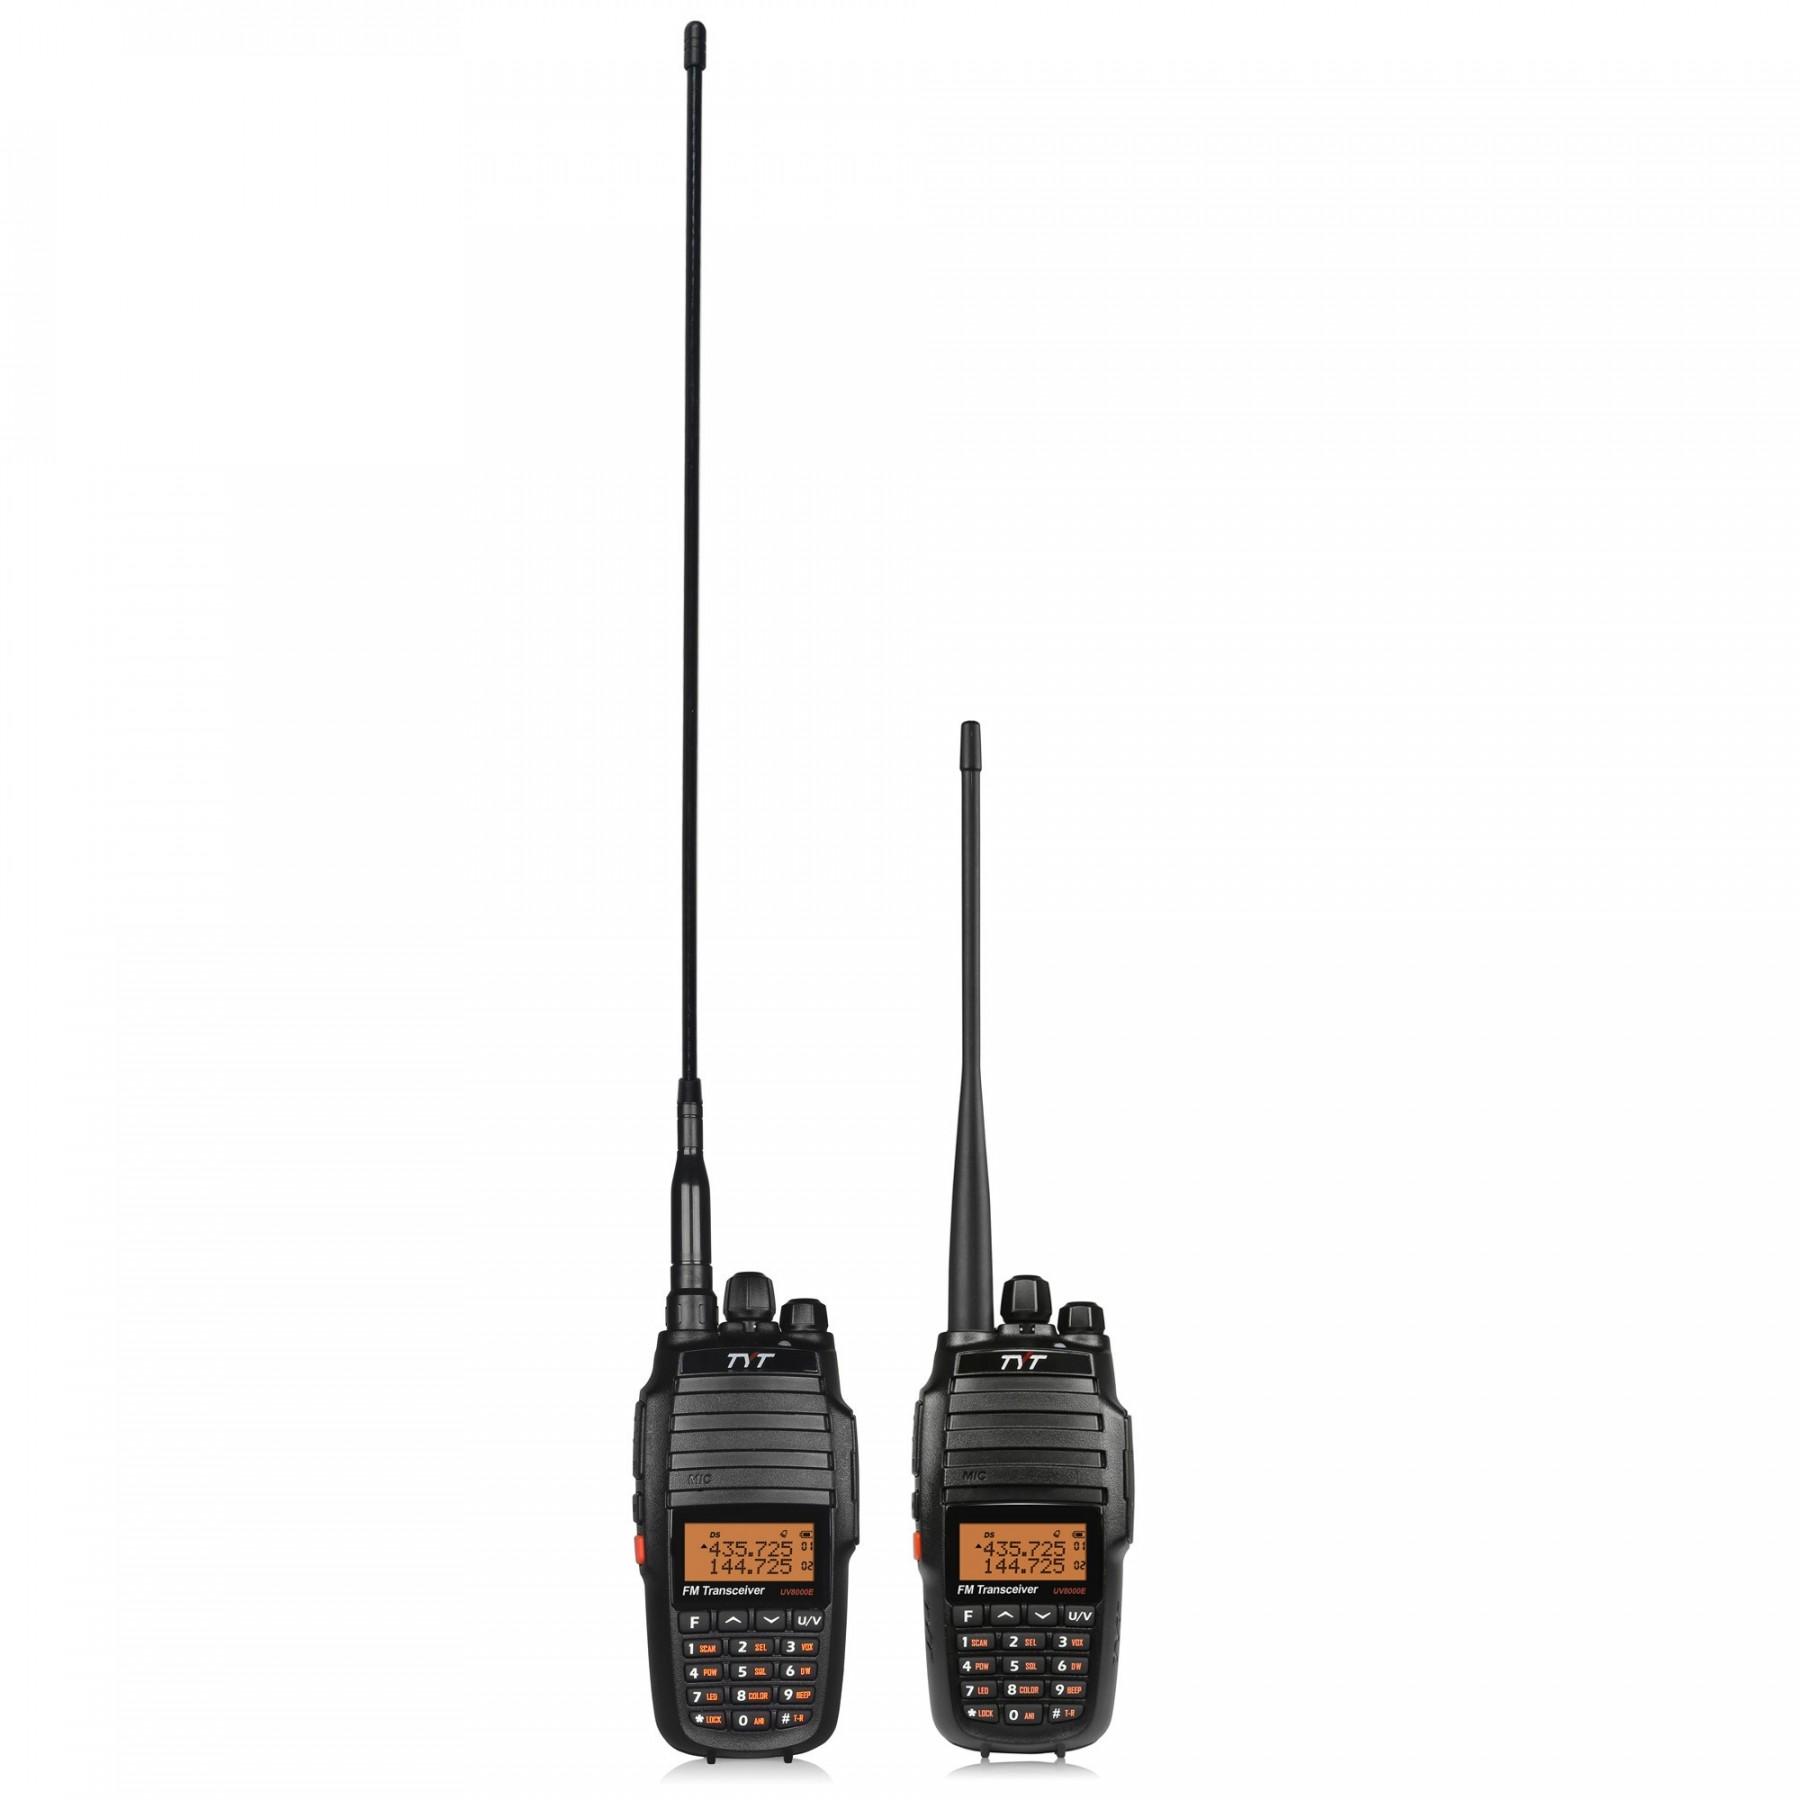 Tyt Uv E Dual Band Two Way Radio Walkie Talkie